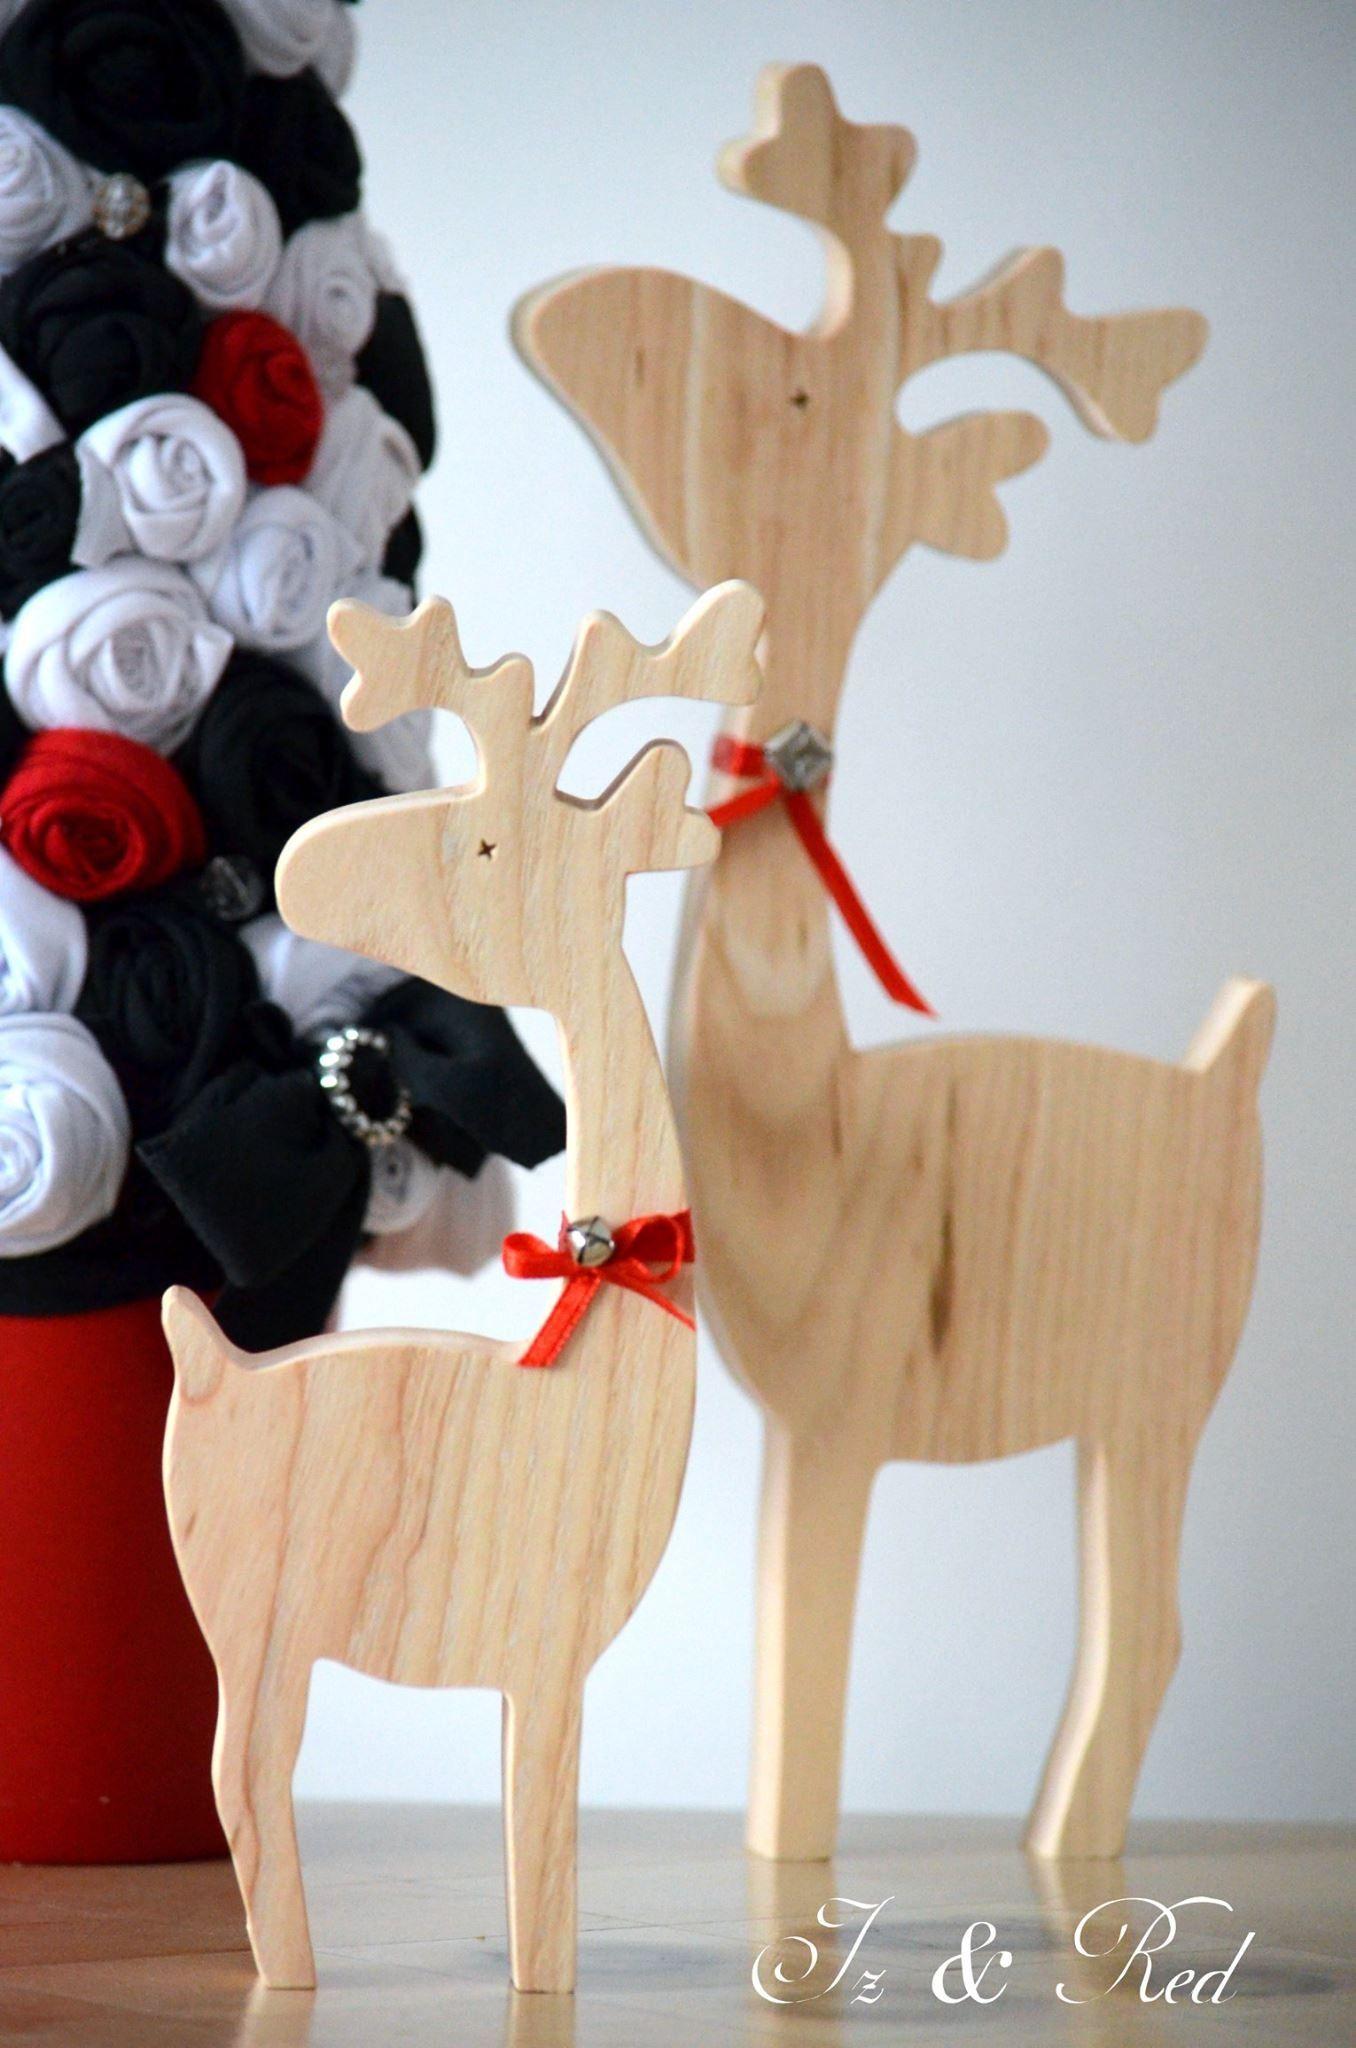 1000 images about woodcarve christmas on pinterest folk - Renos de navidad con luces ...